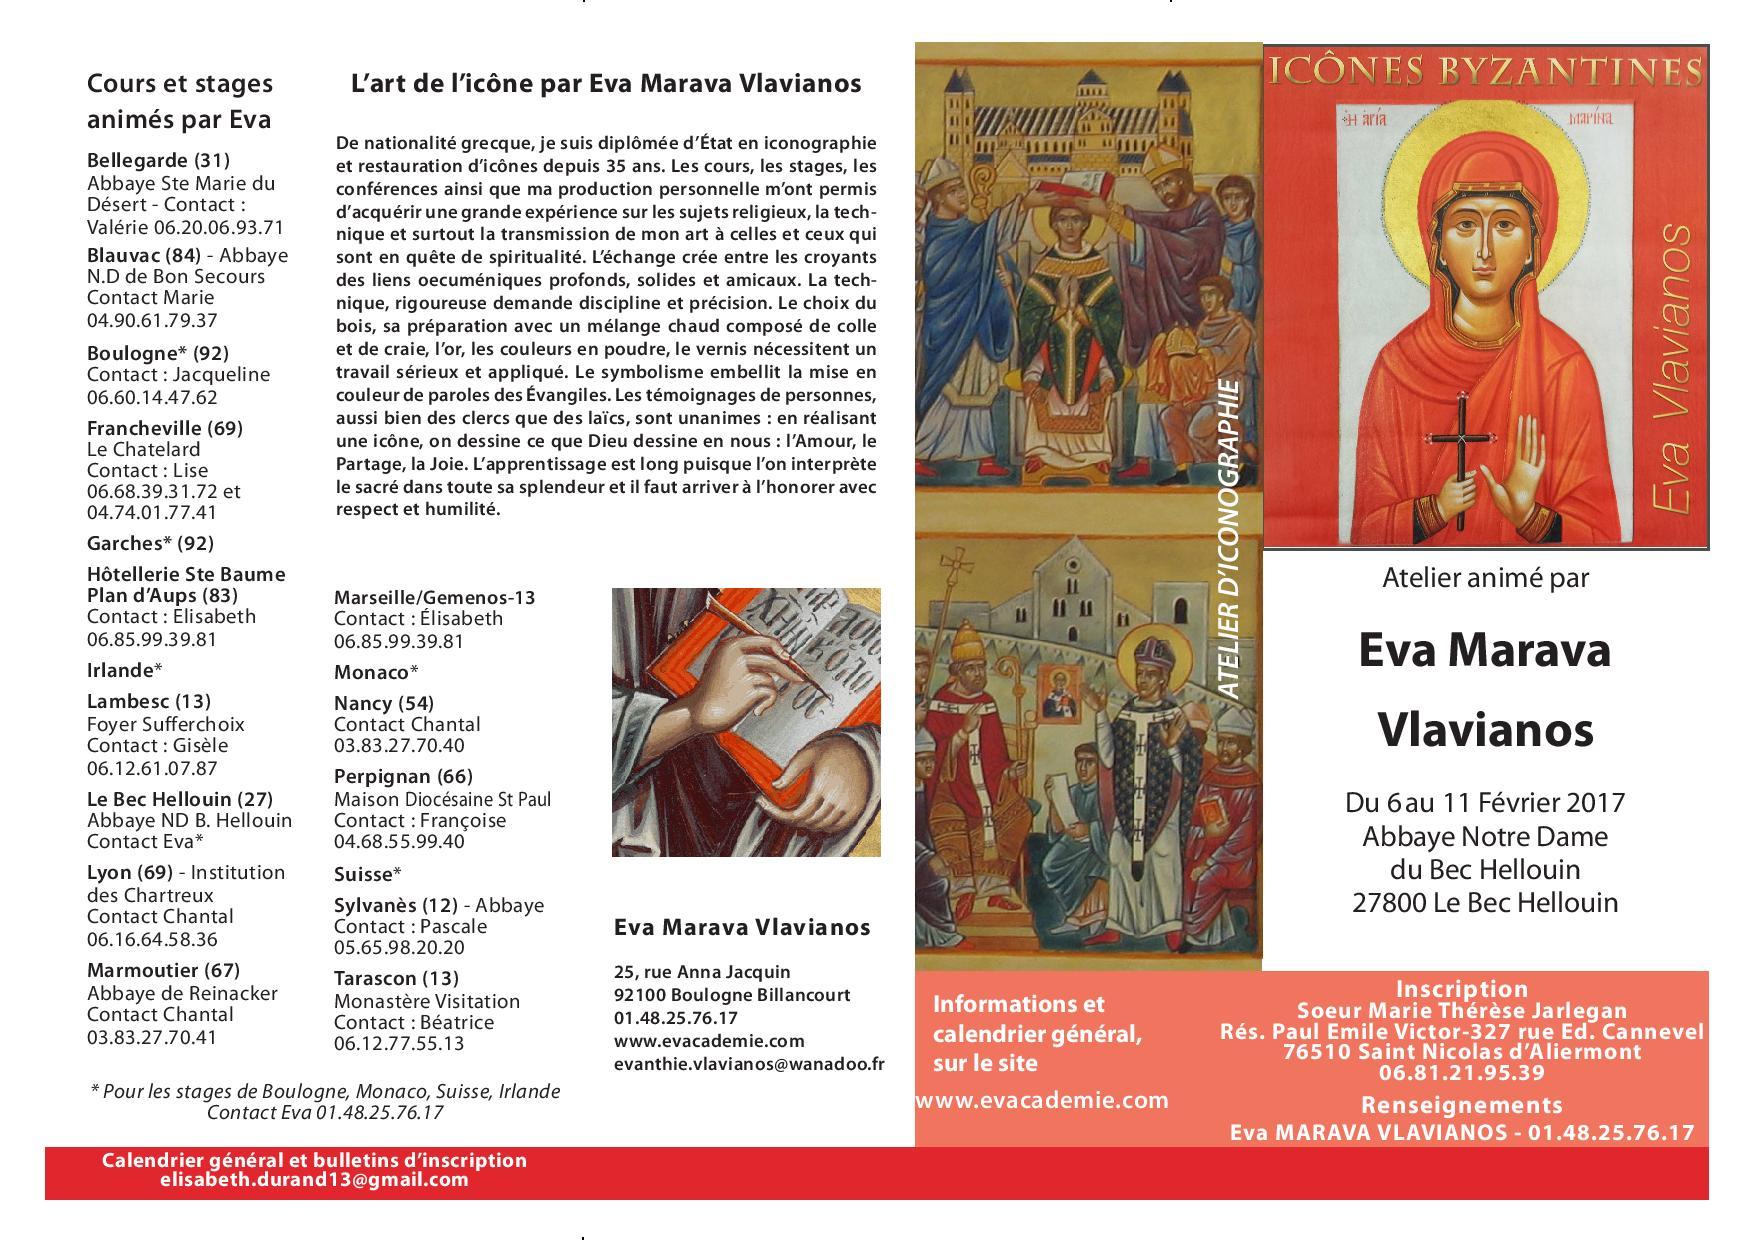 brochure-2017-bec-hellouin-5b310-5d-page-001